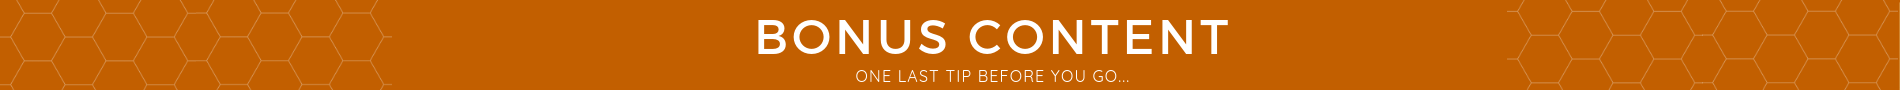 eisley-images-bonus-blog-content.jpg